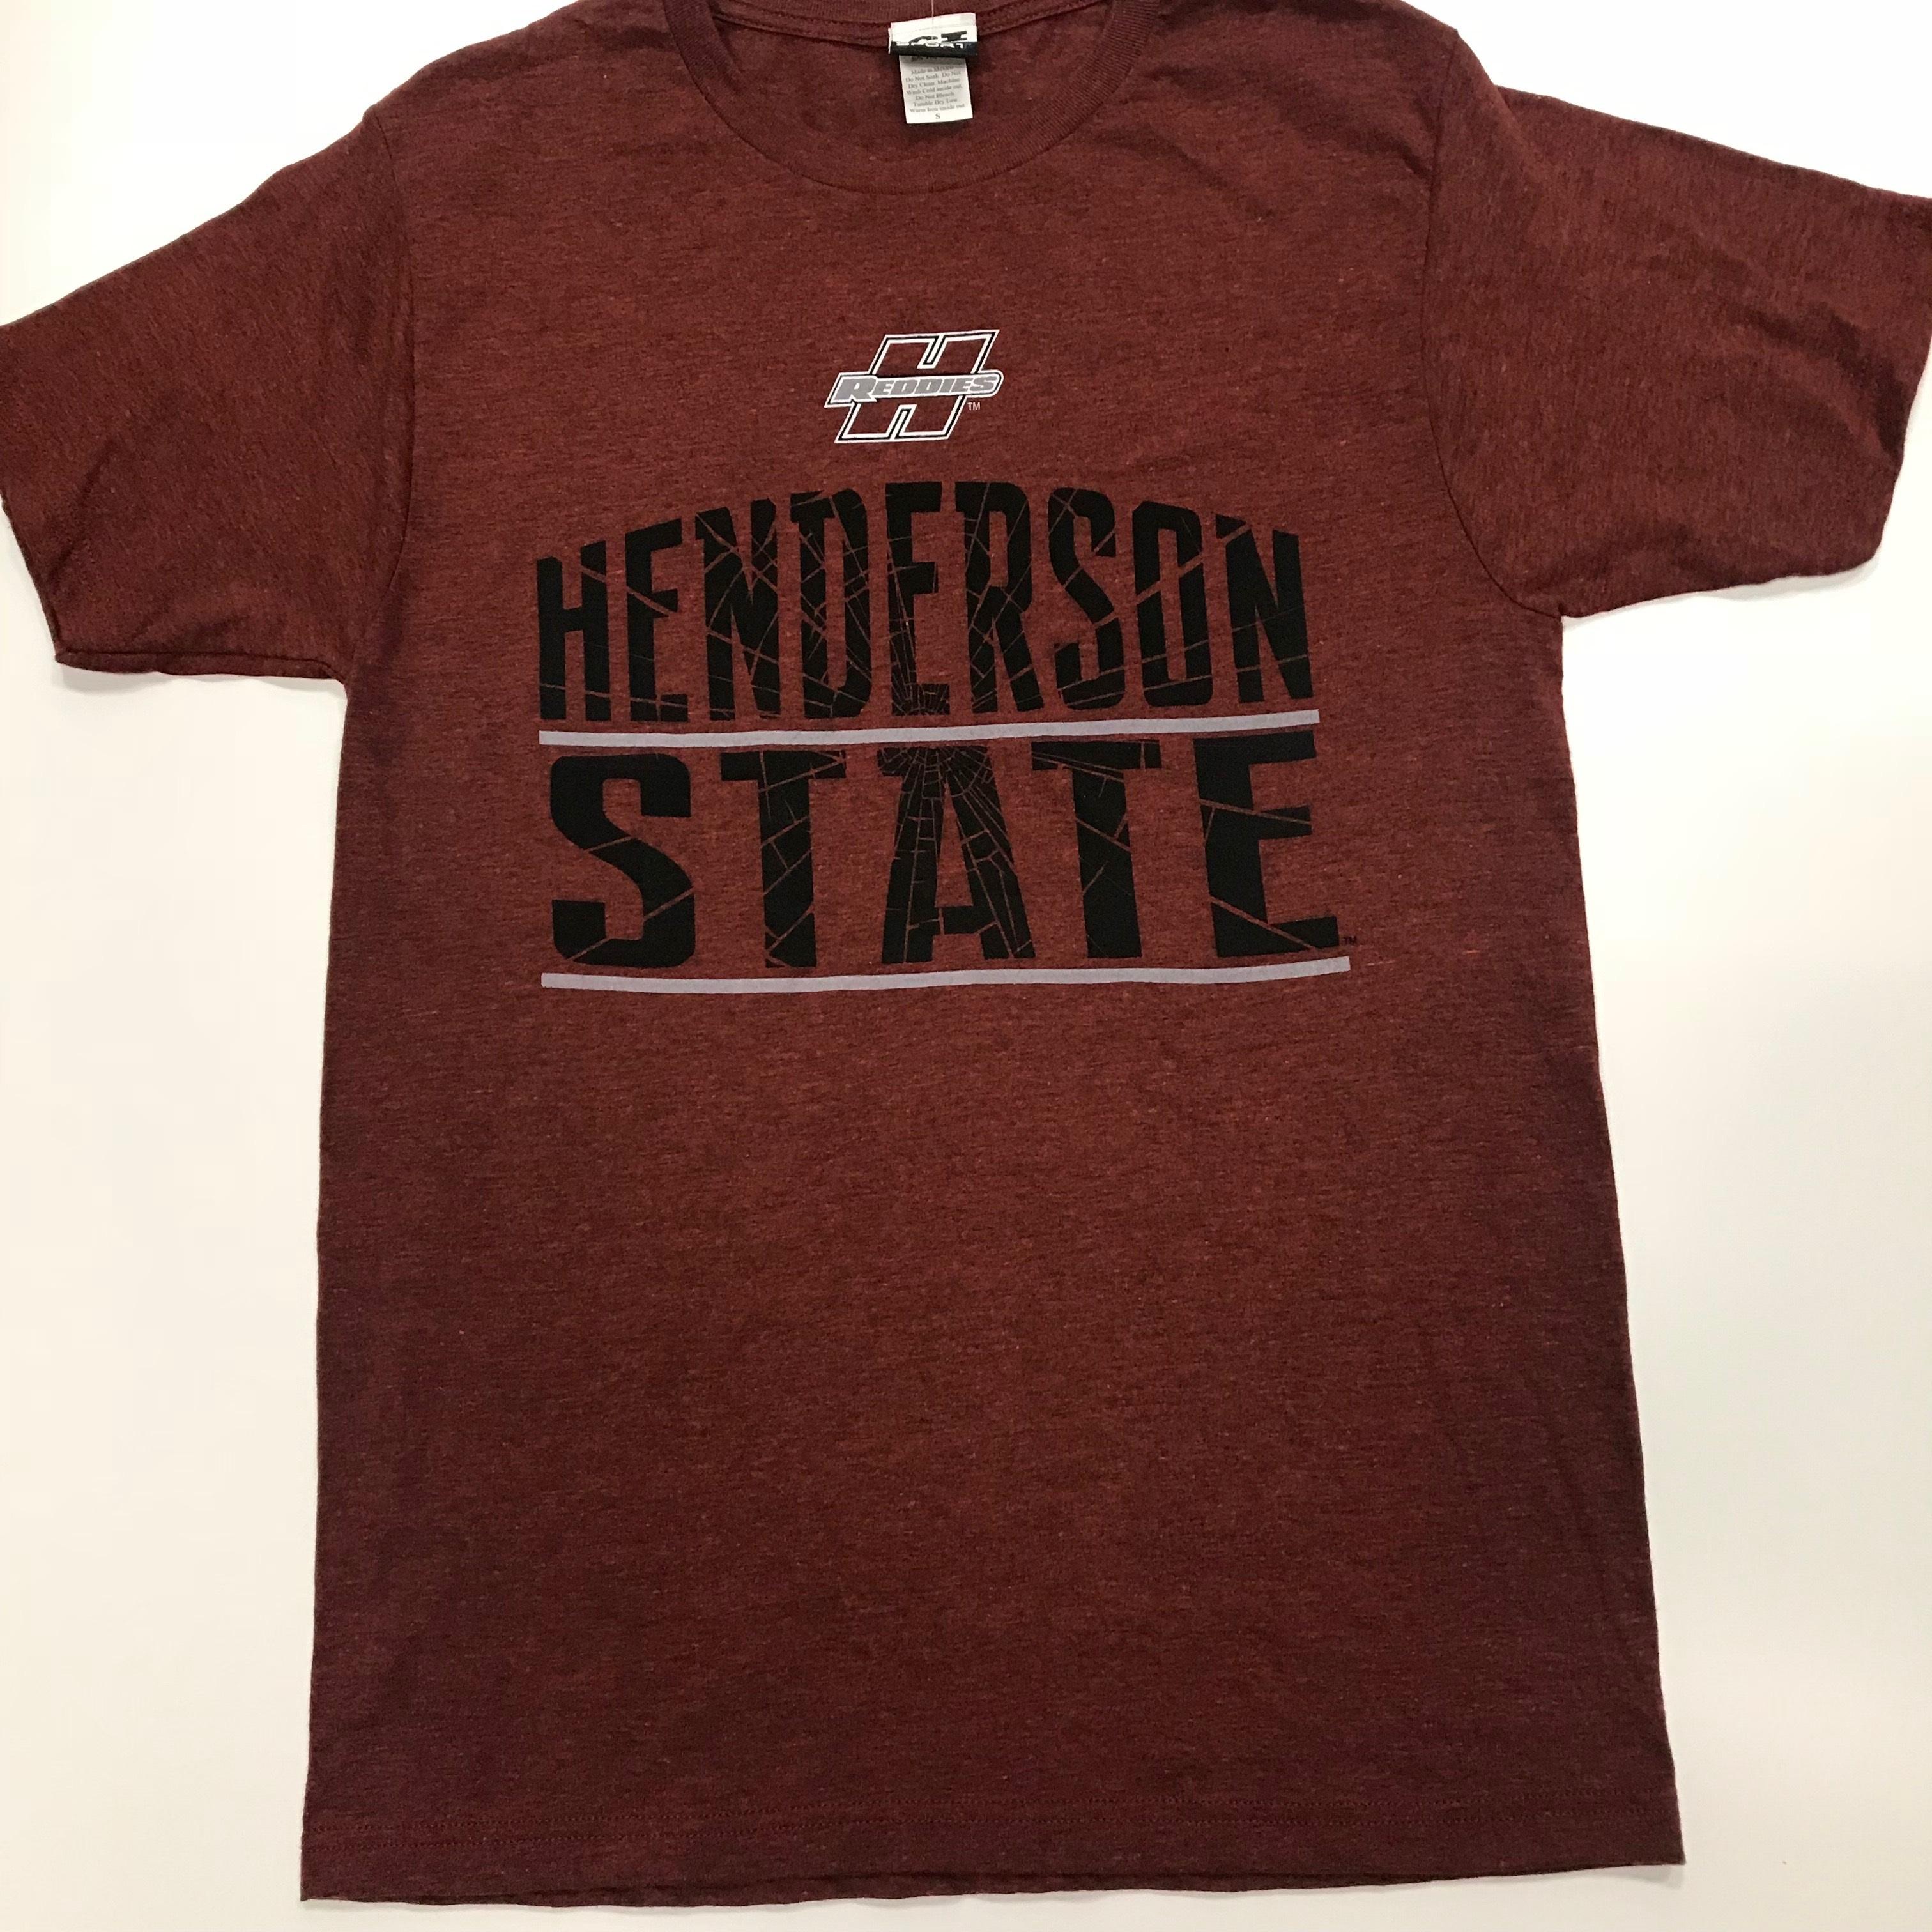 Henderson State Web Tee